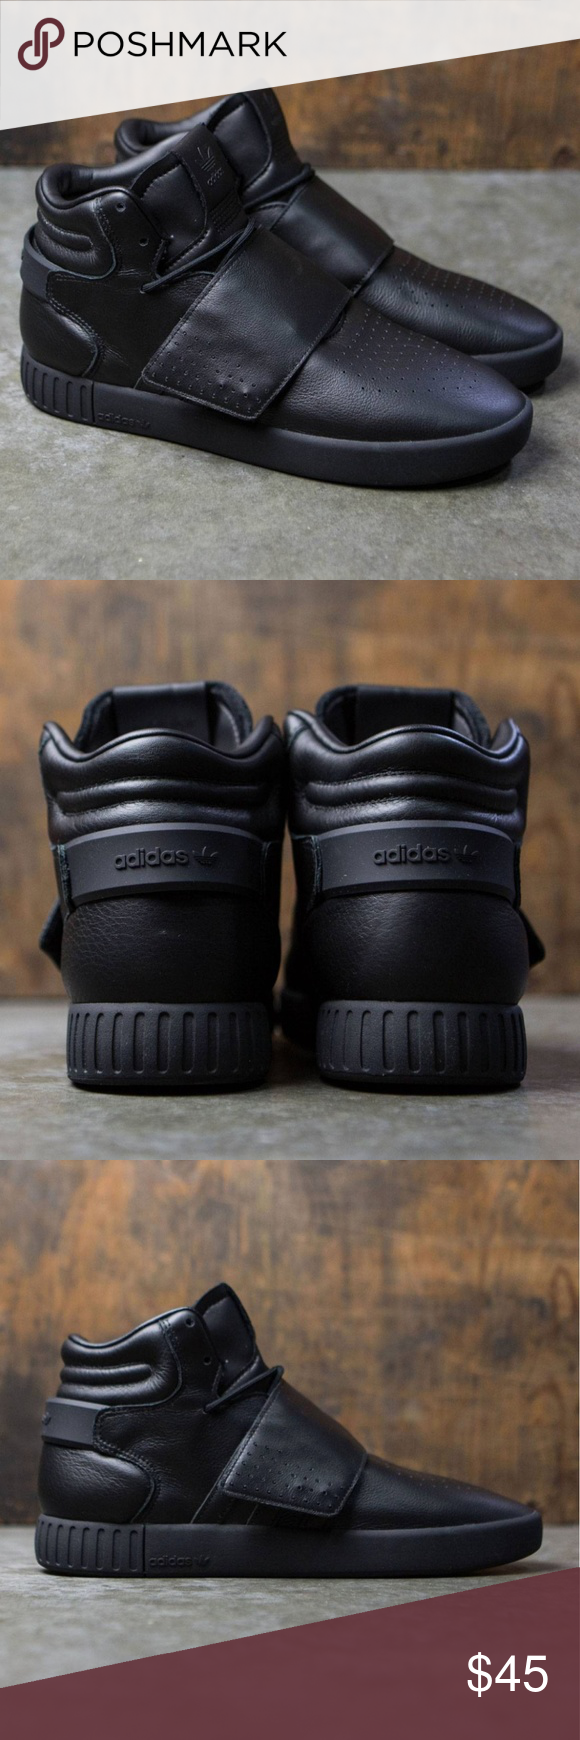 La scarpa di adidas tubulare invasore nwt adidas, adidas